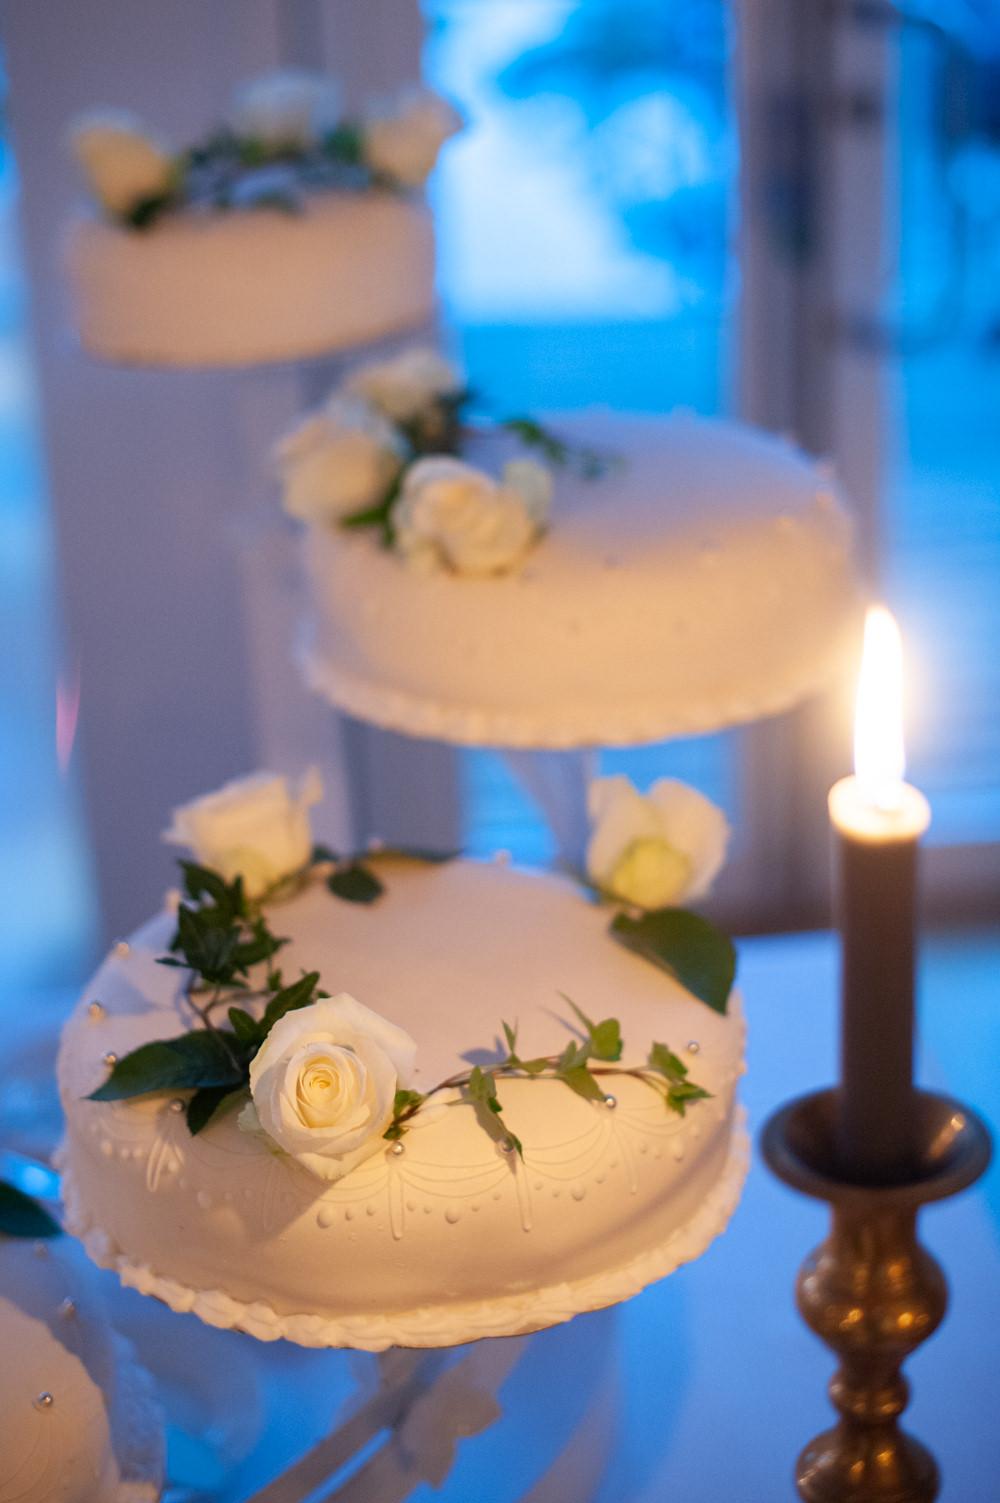 Cake Iced Flowers Candles Greenery Norway Wedding Maximilian Photography